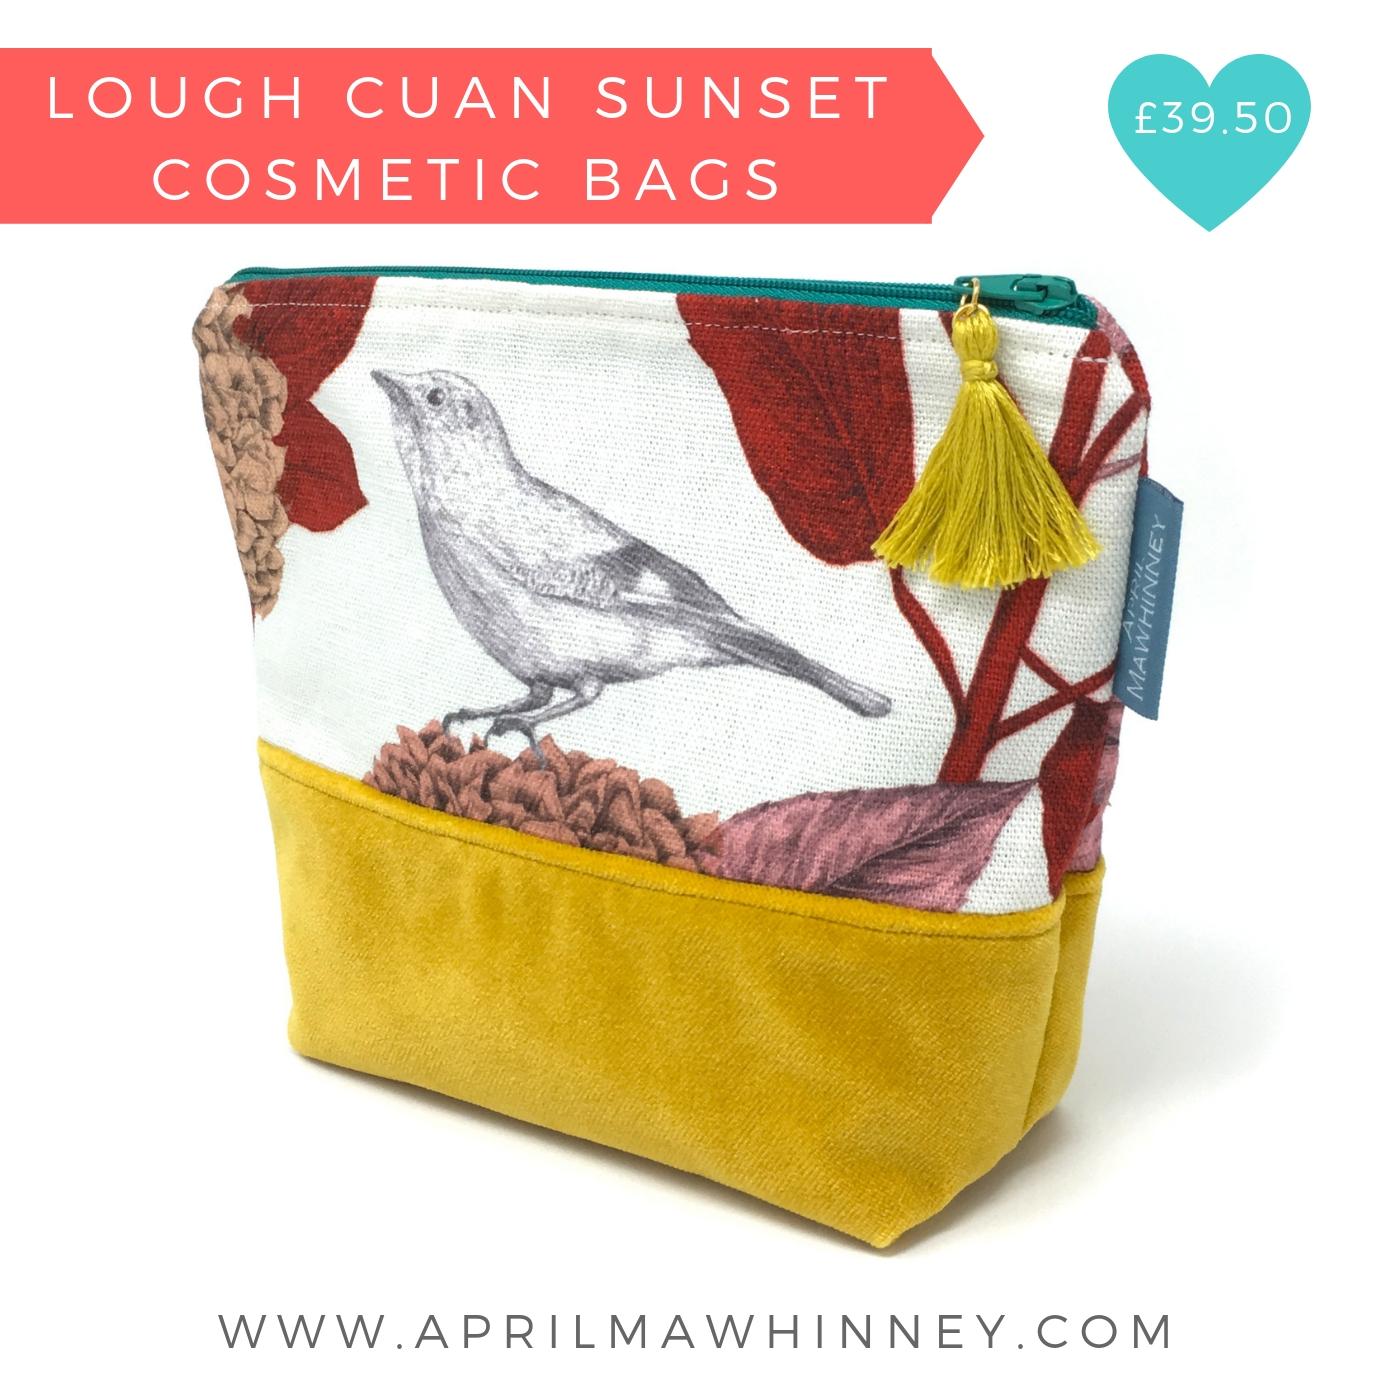 Lough Cuan Linen and Velvet Cosmetic Bags | April Mawhinney Design Studio | Christmas Designer Maker 2018 Gift Guide